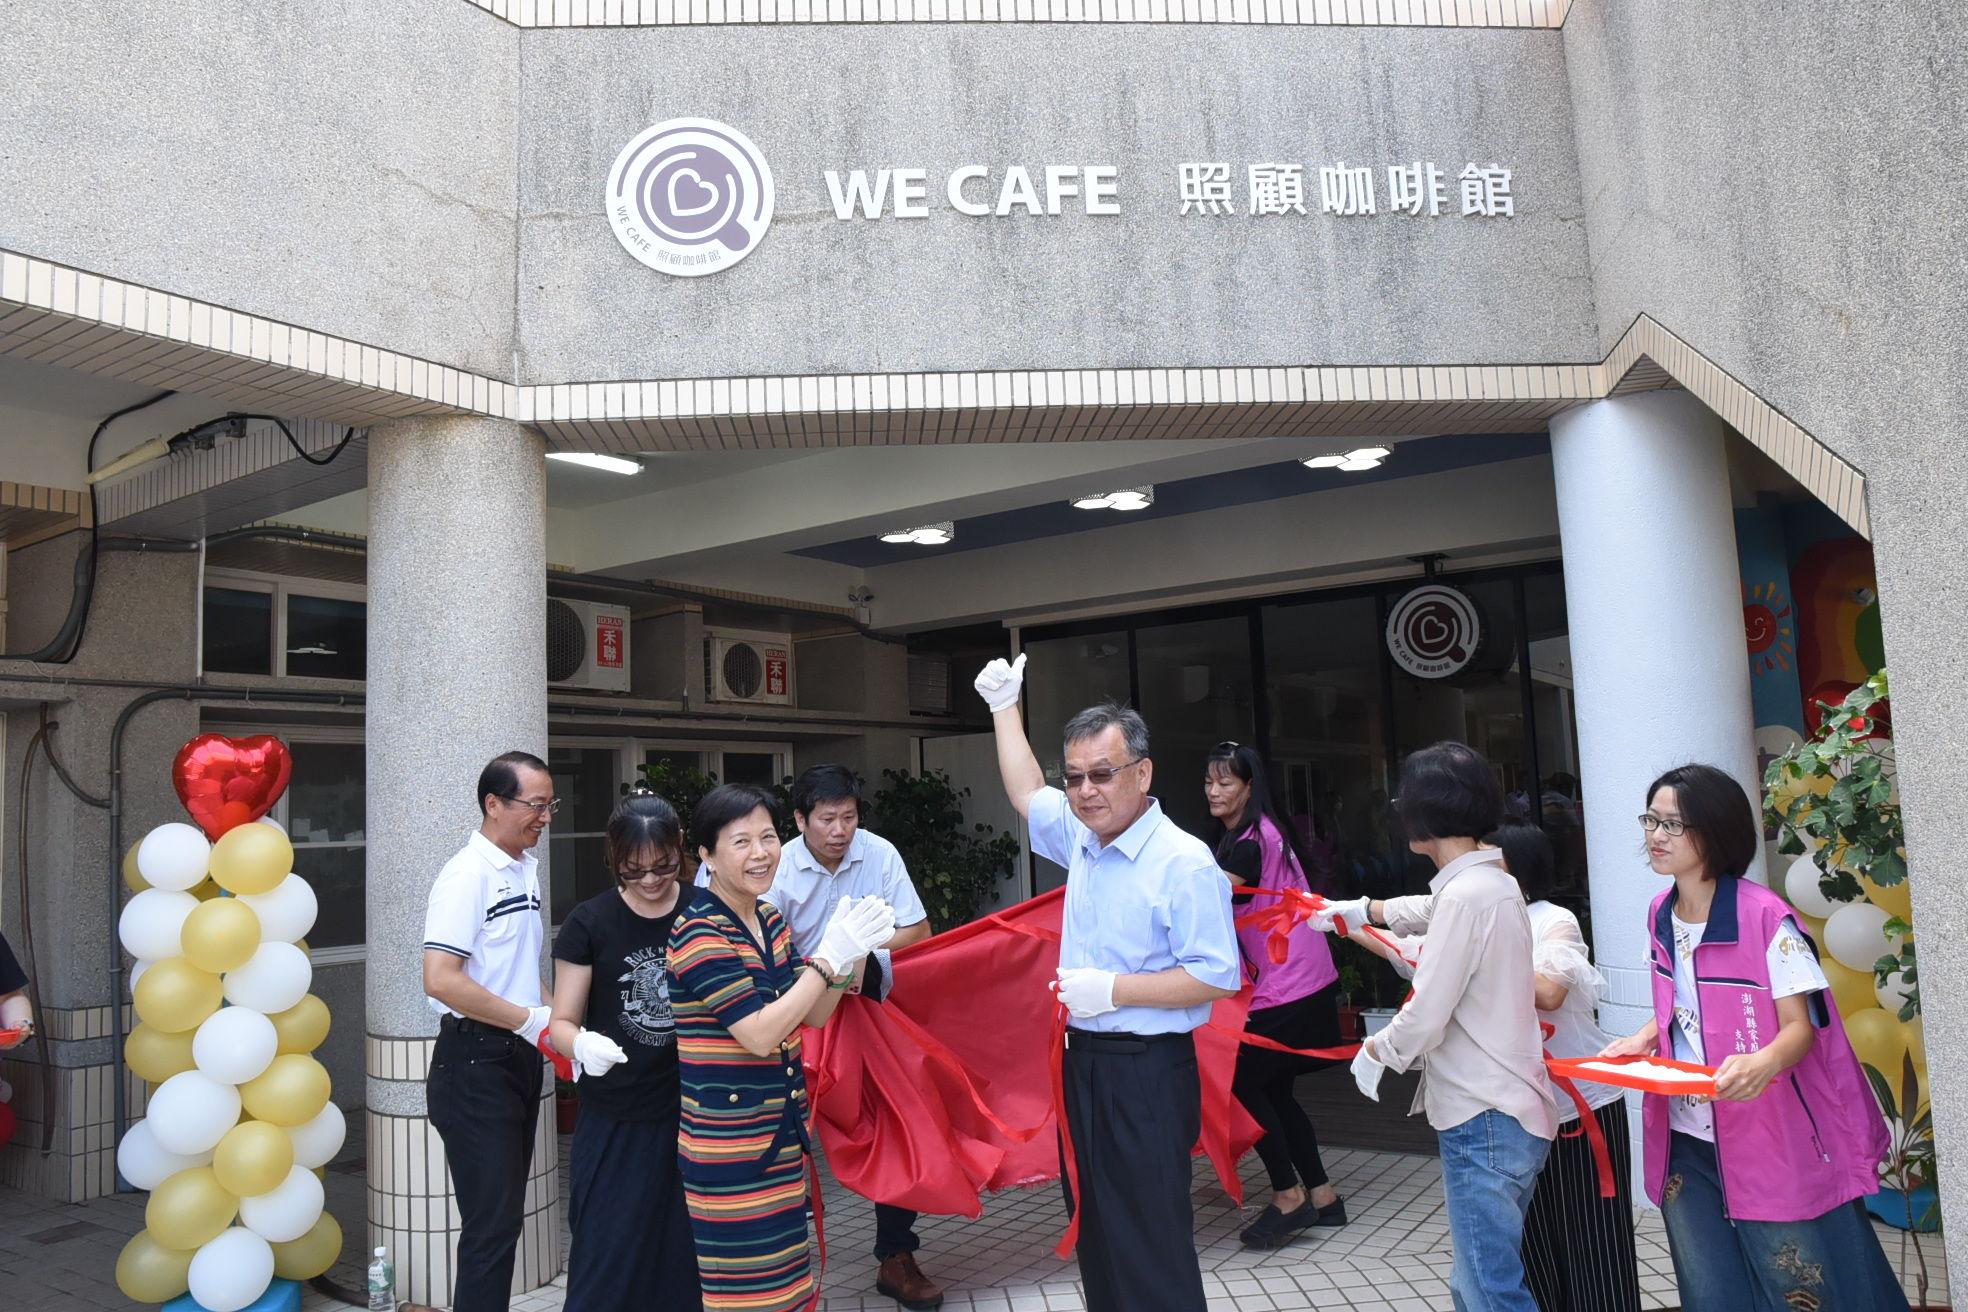 WE CAFE照顧咖啡館揭牌